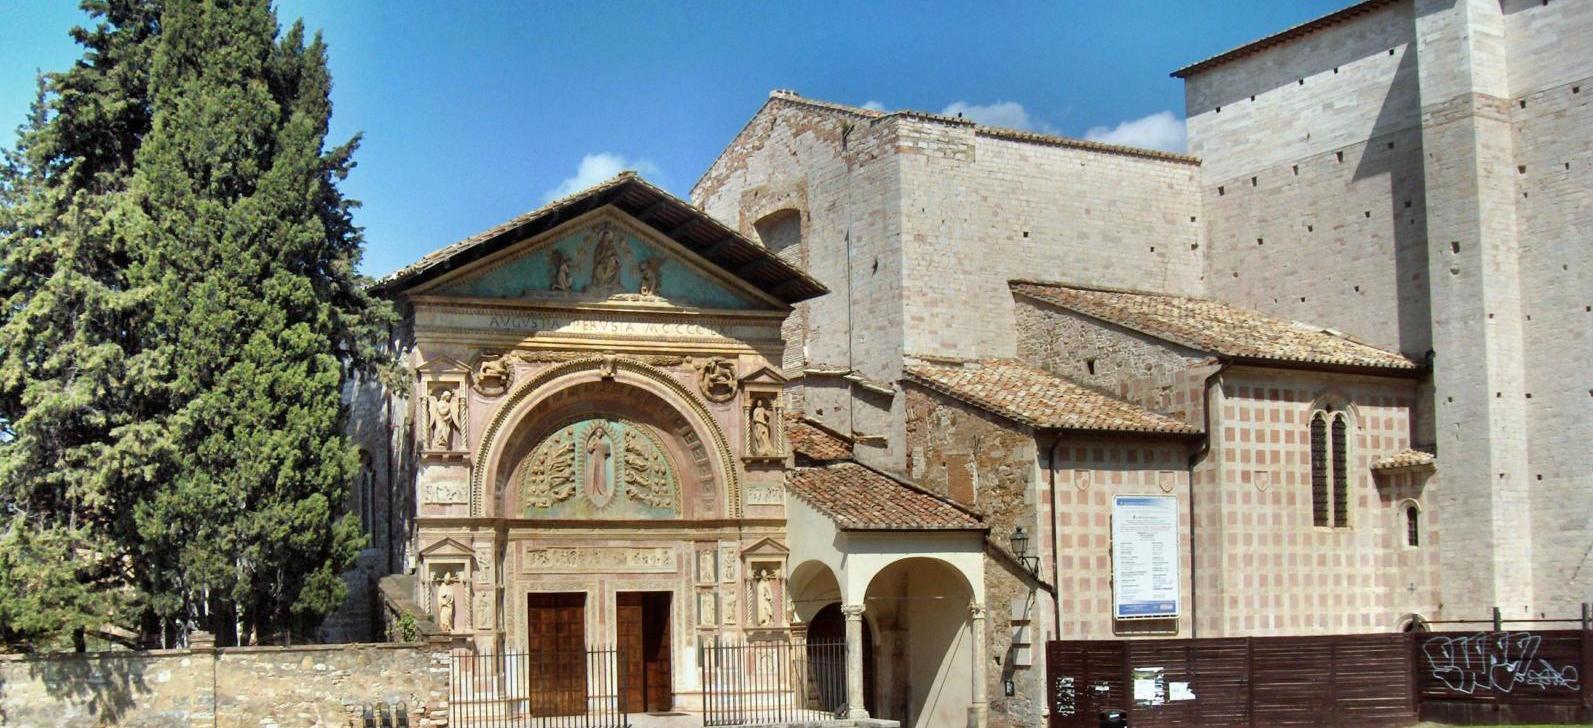 Accademia di Belle Arti di Perugia